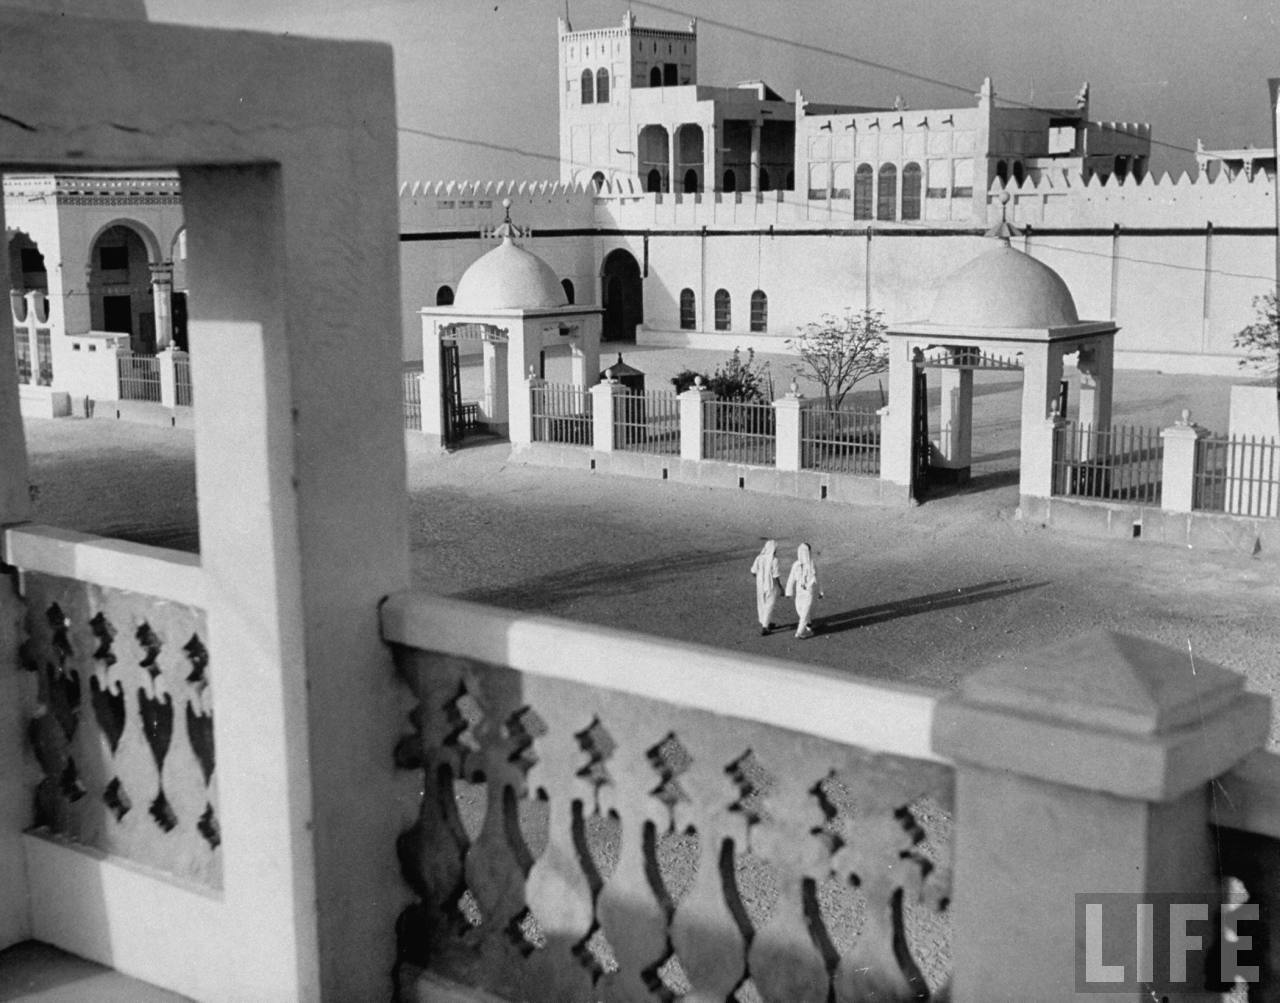 Best Discount Hotels in Bahrain